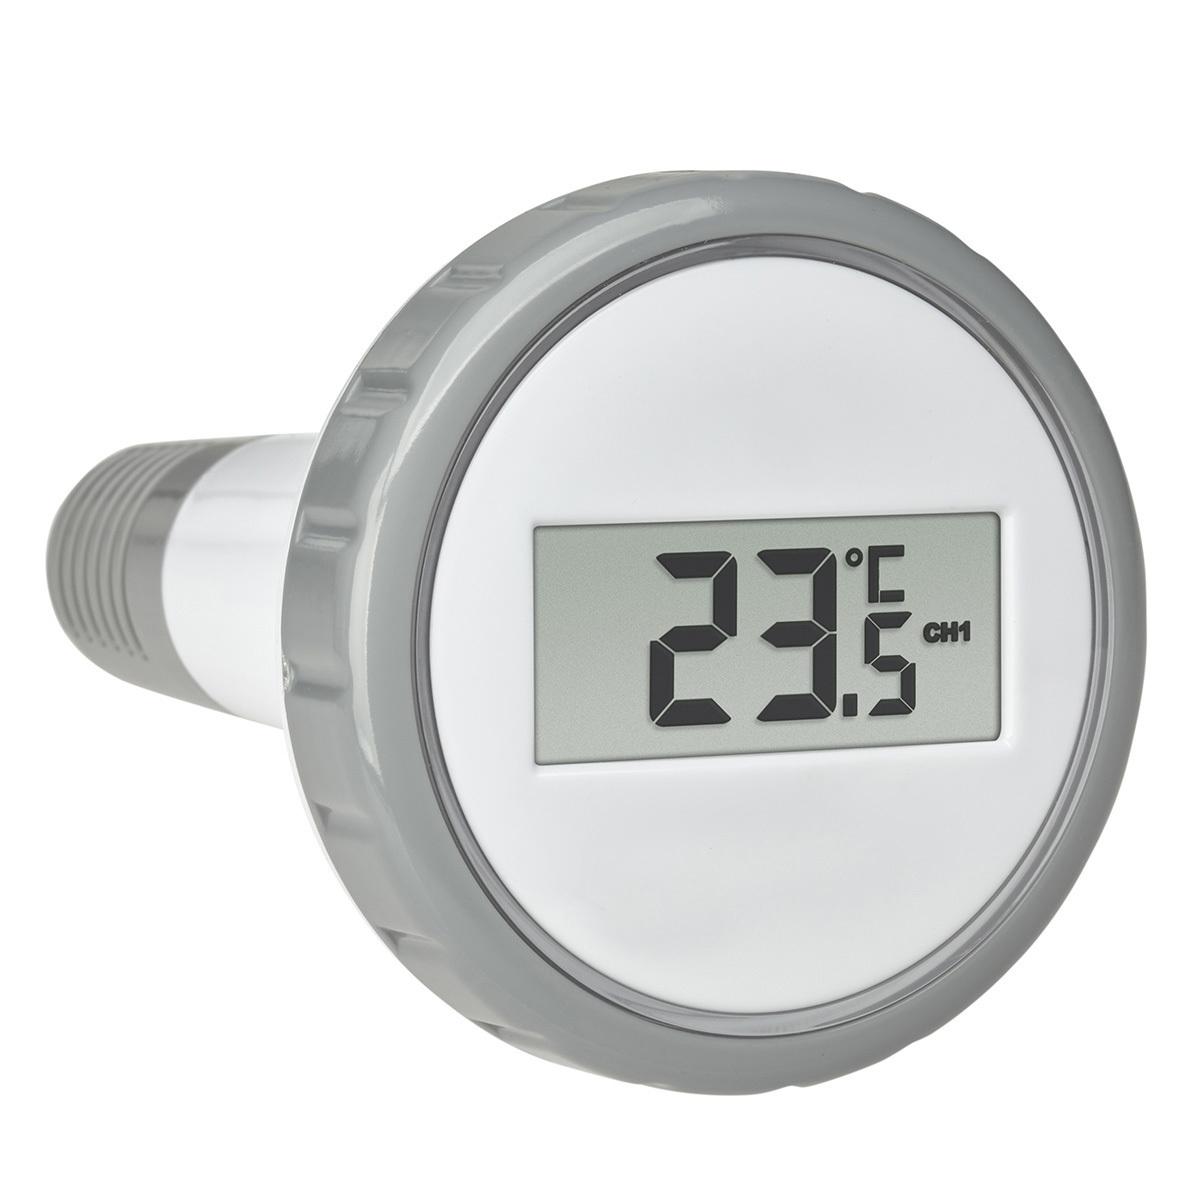 30-3067-10-funk-poolthermometer-palma-sender-1200x1200px.jpg